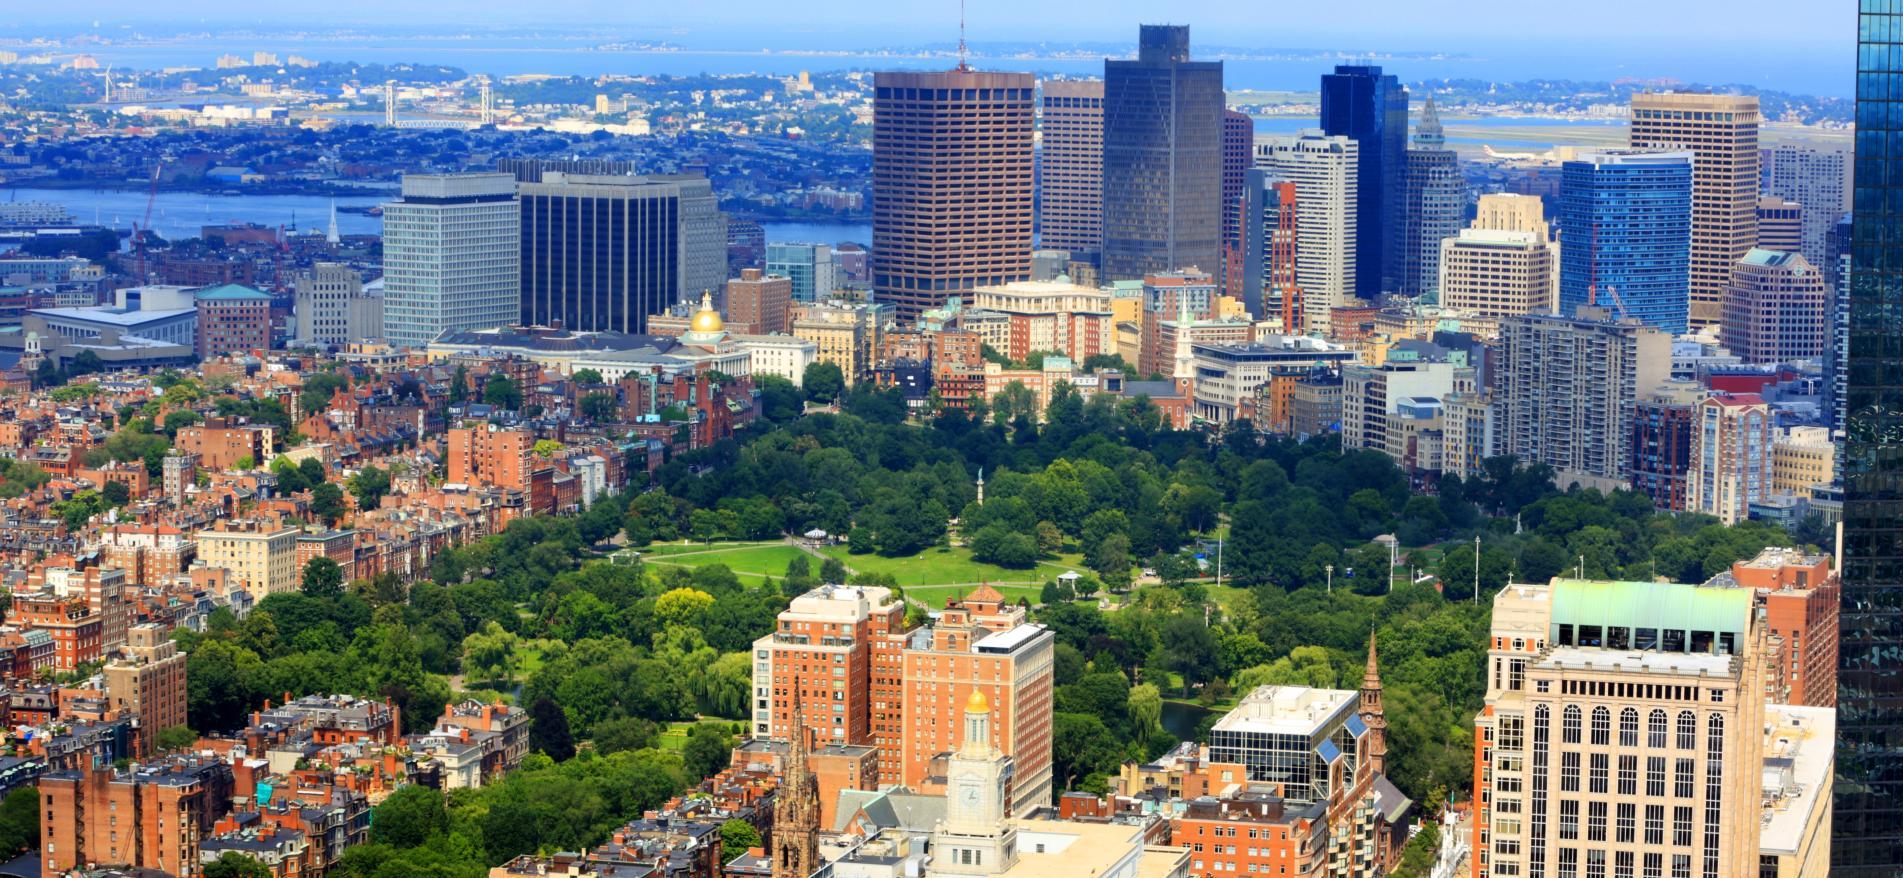 Boston Guide Hotels Restaurants Meetings Amp Things To